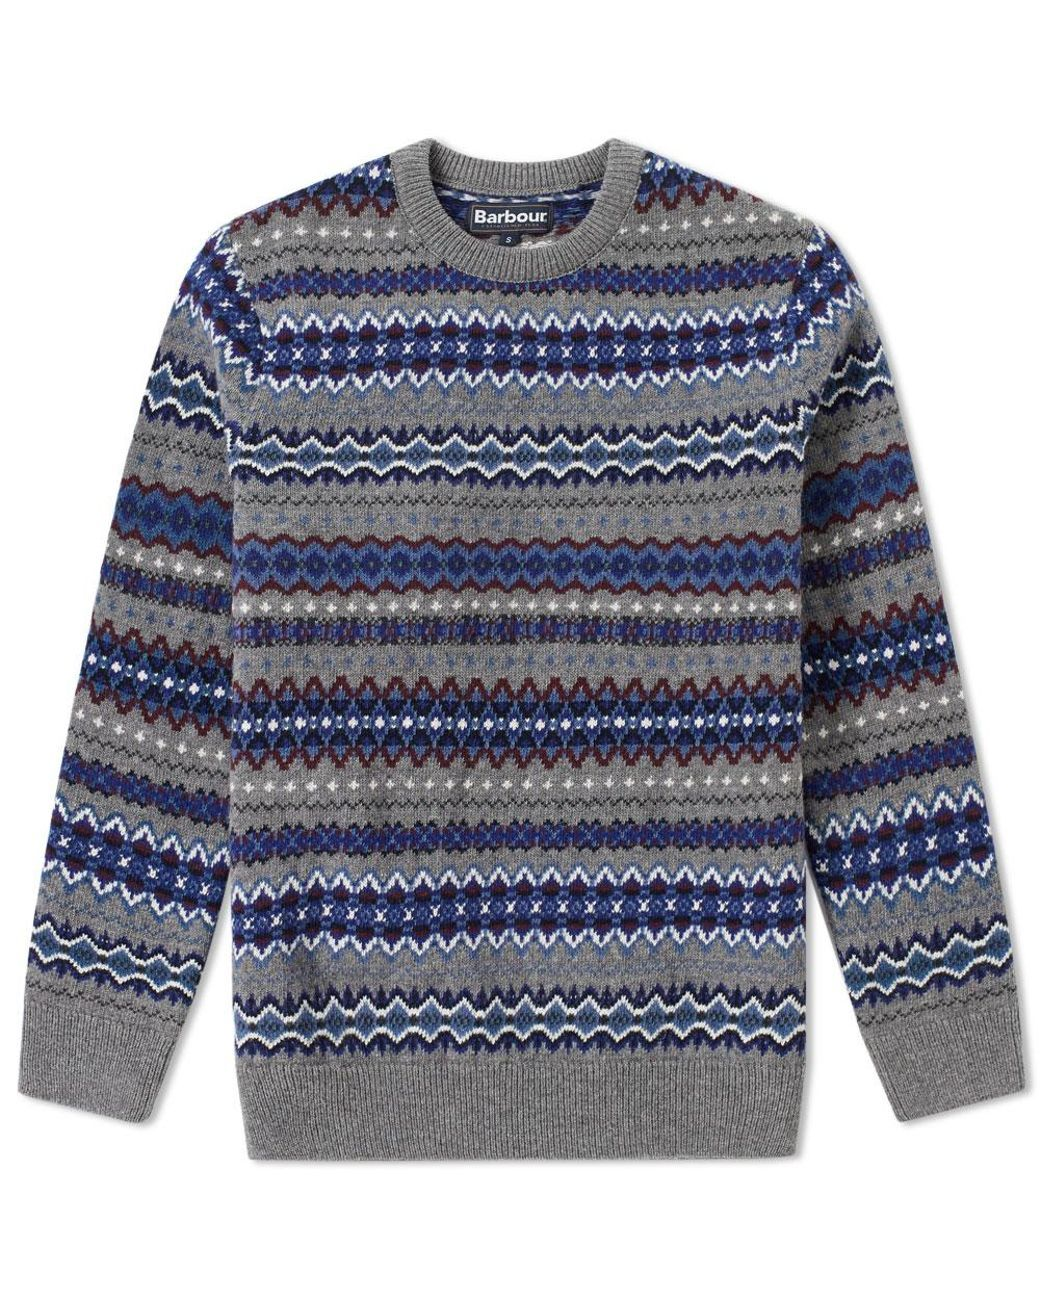 999b534e8258 Men's Gray Case Fair Isle Crew Knit | Varma tröjor | Barbour ...